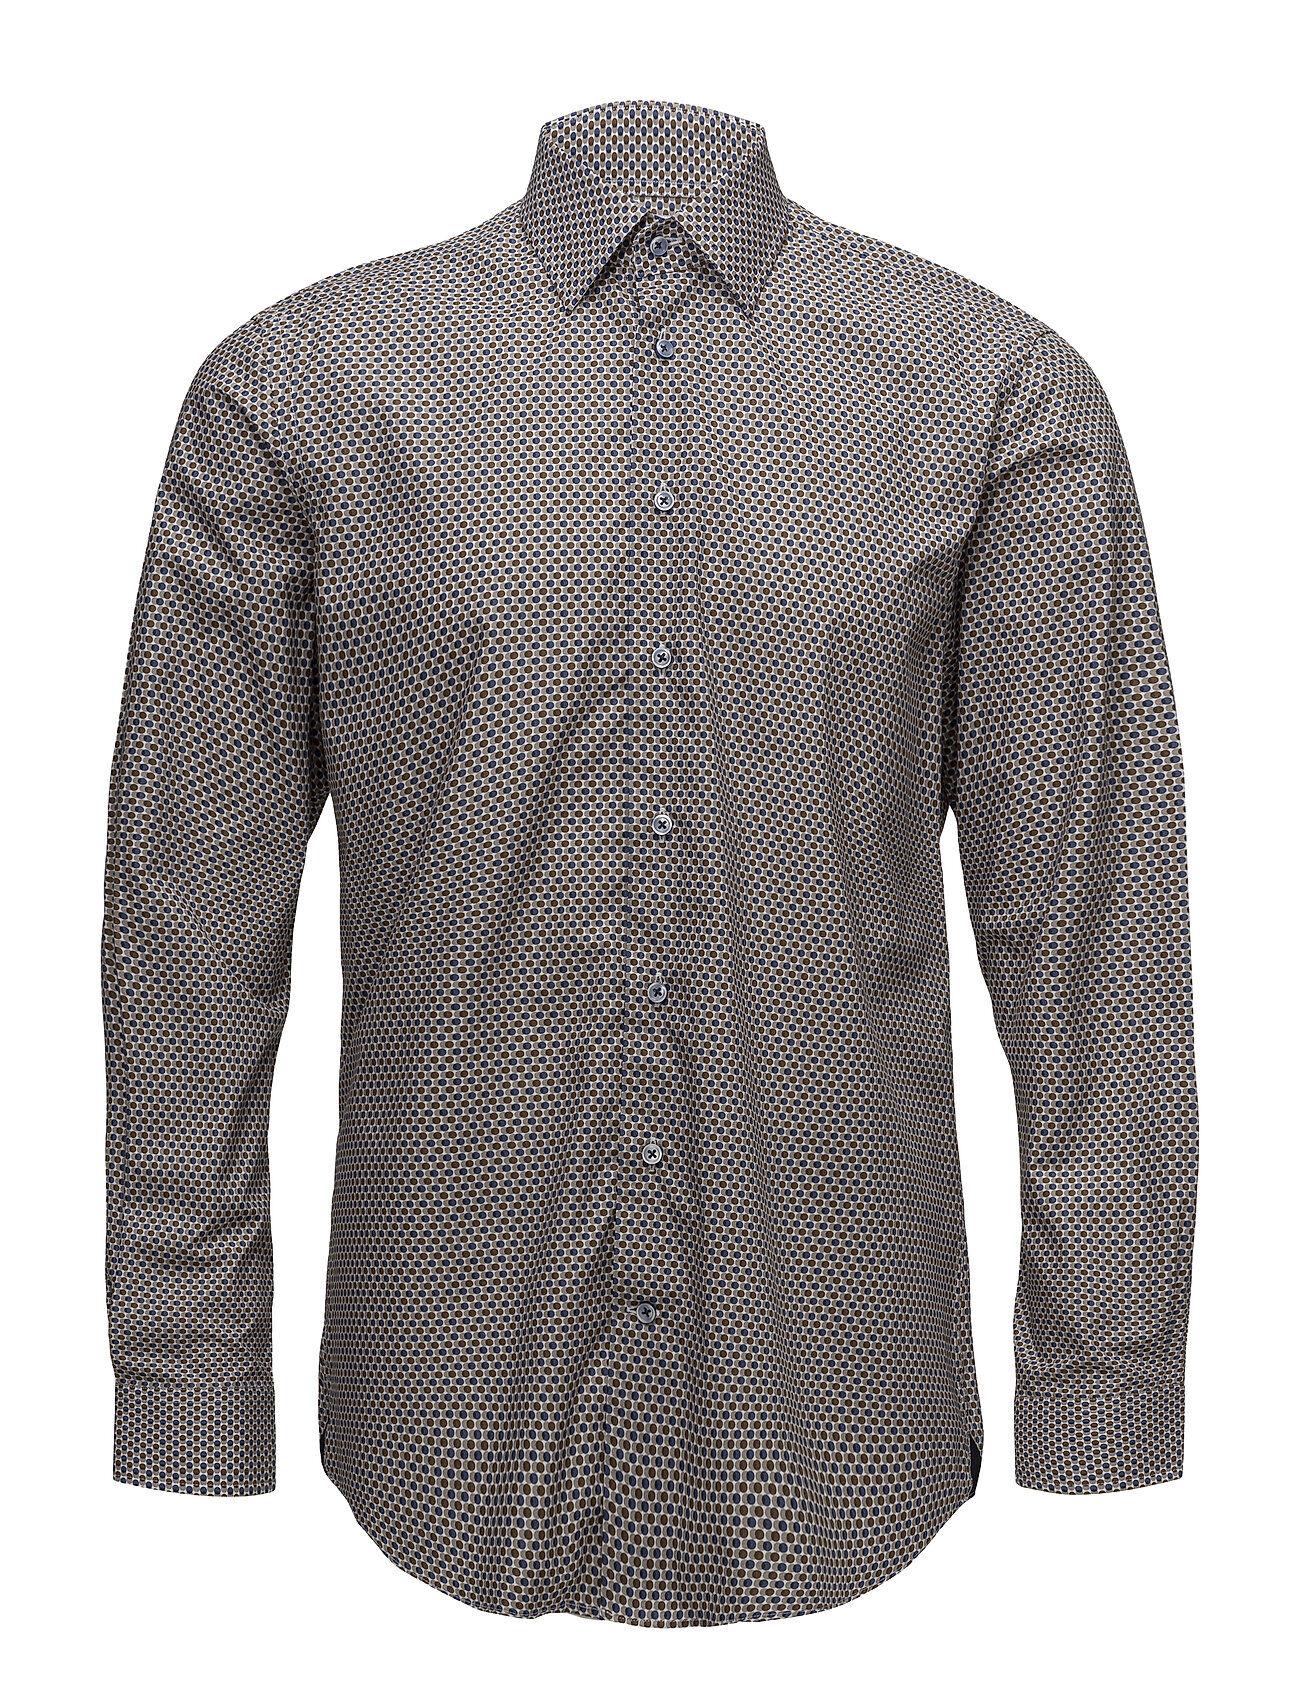 XO Shirtmaker by Sand Copenhagen 8064 - Gordon Sc